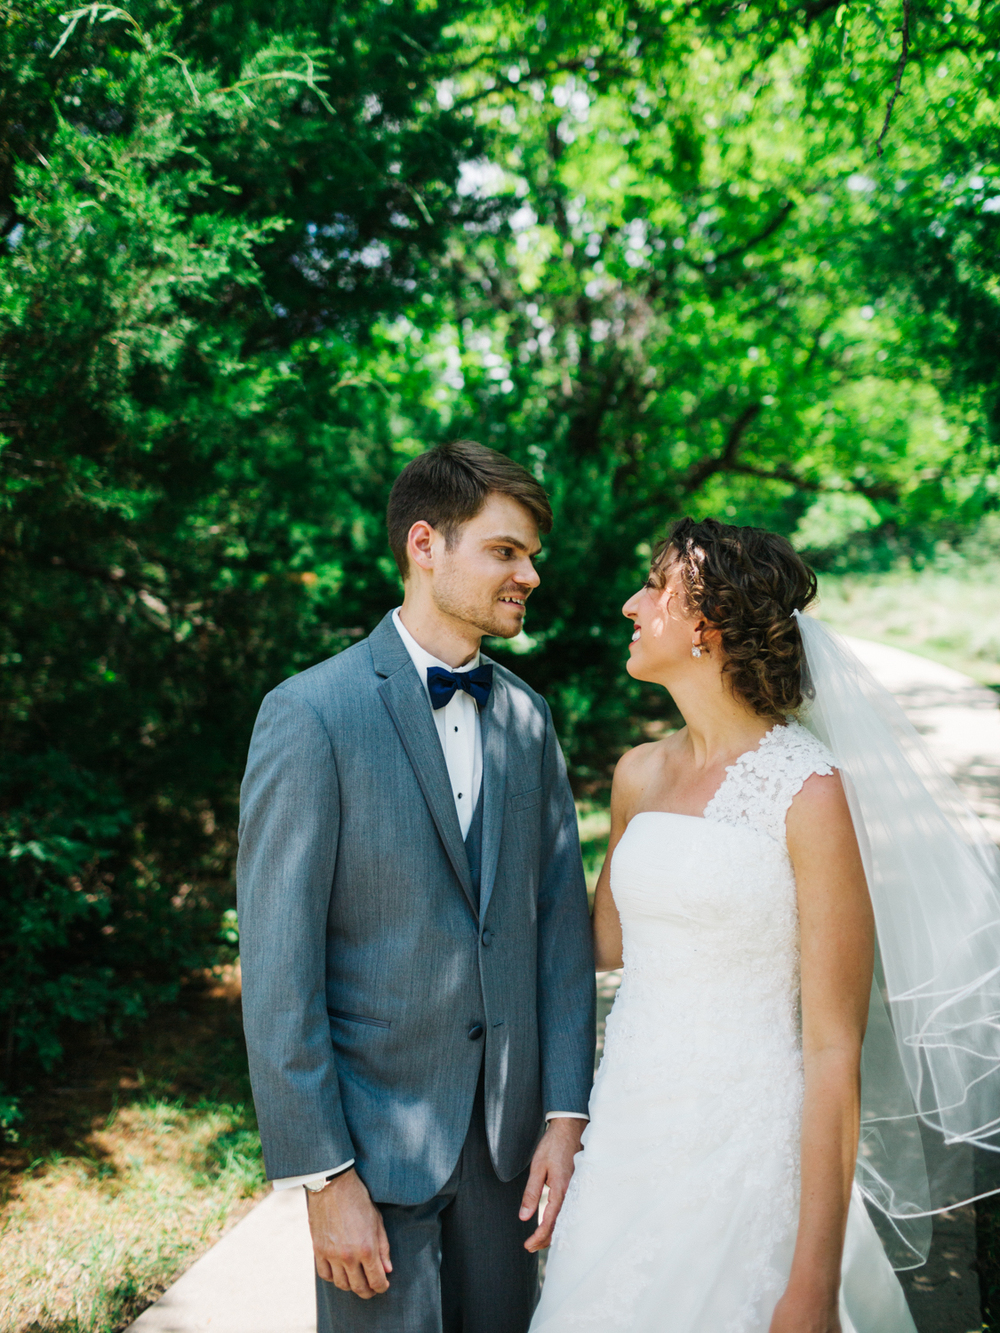 Wichita, Kansas Wedding Photographer - Neal Dieker - Wedding Photography-146.jpg